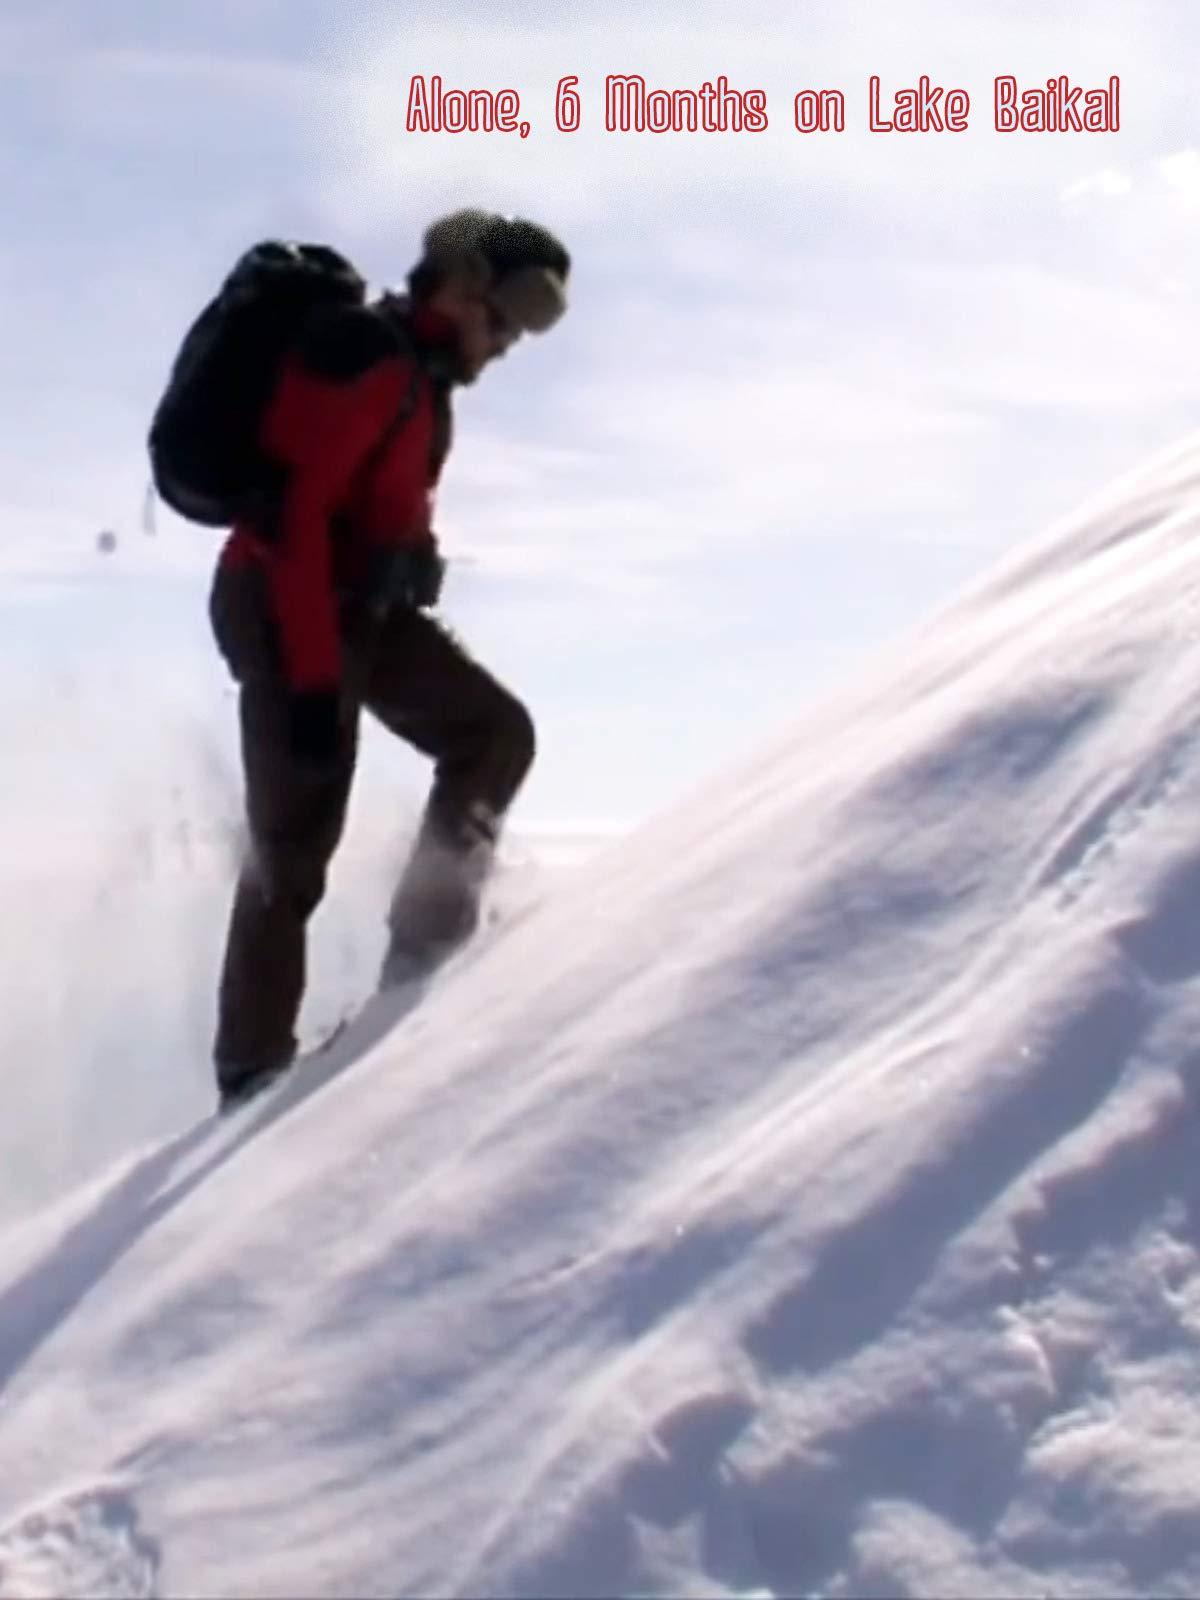 Alone 6 Months On Lake Baikal on Amazon Prime Video UK